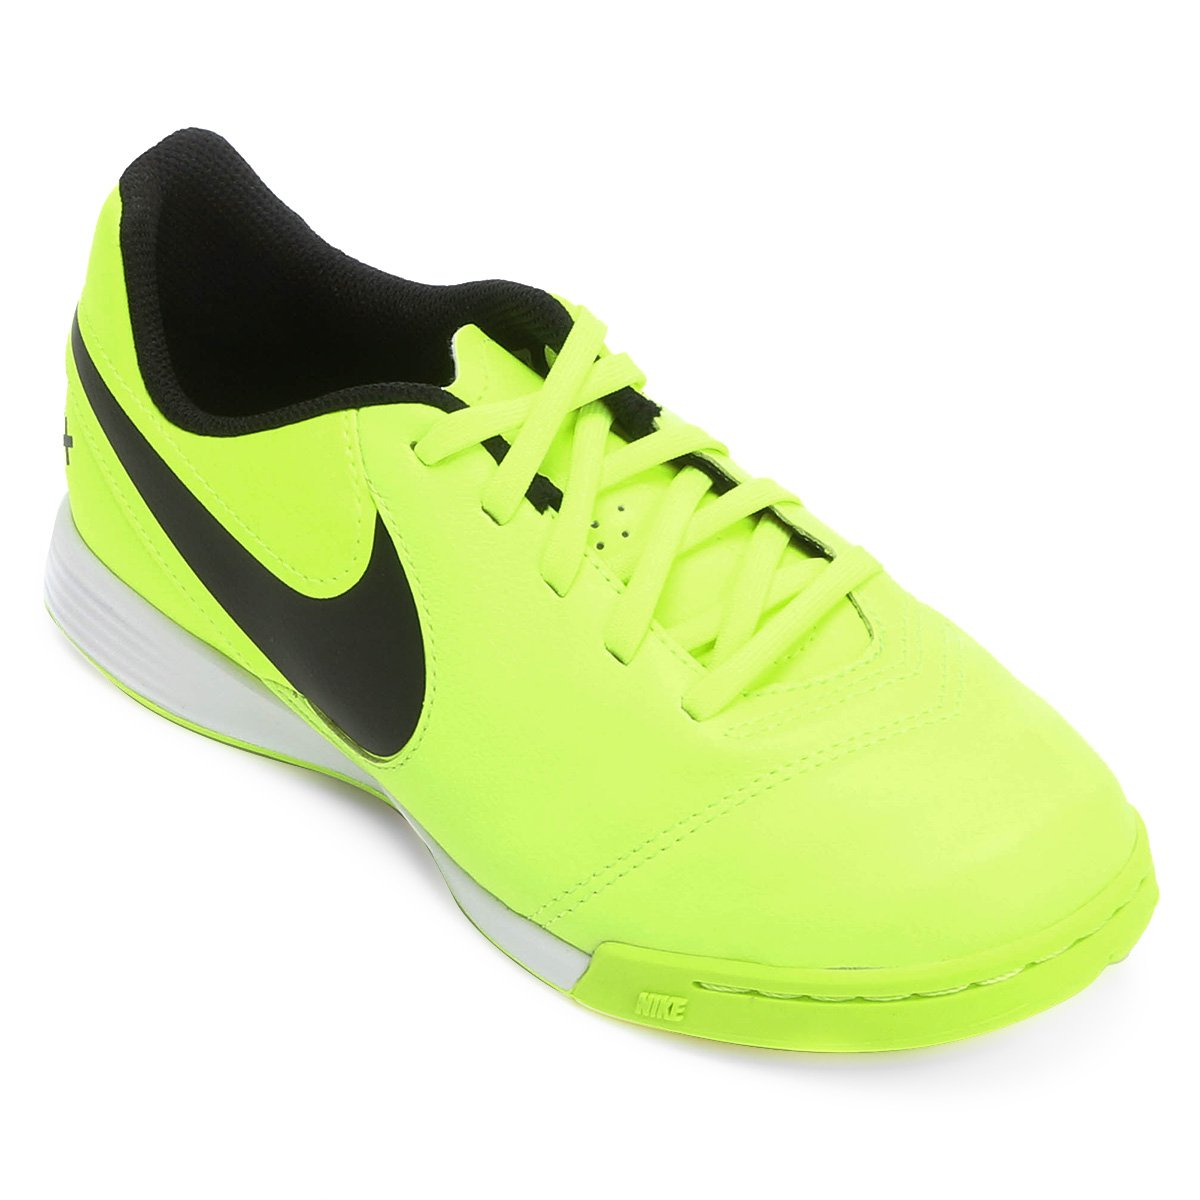 Chuteira Futsal Infantil Nike Tiempo Rio 3 IC - Compre Agora  09c77c8a47985